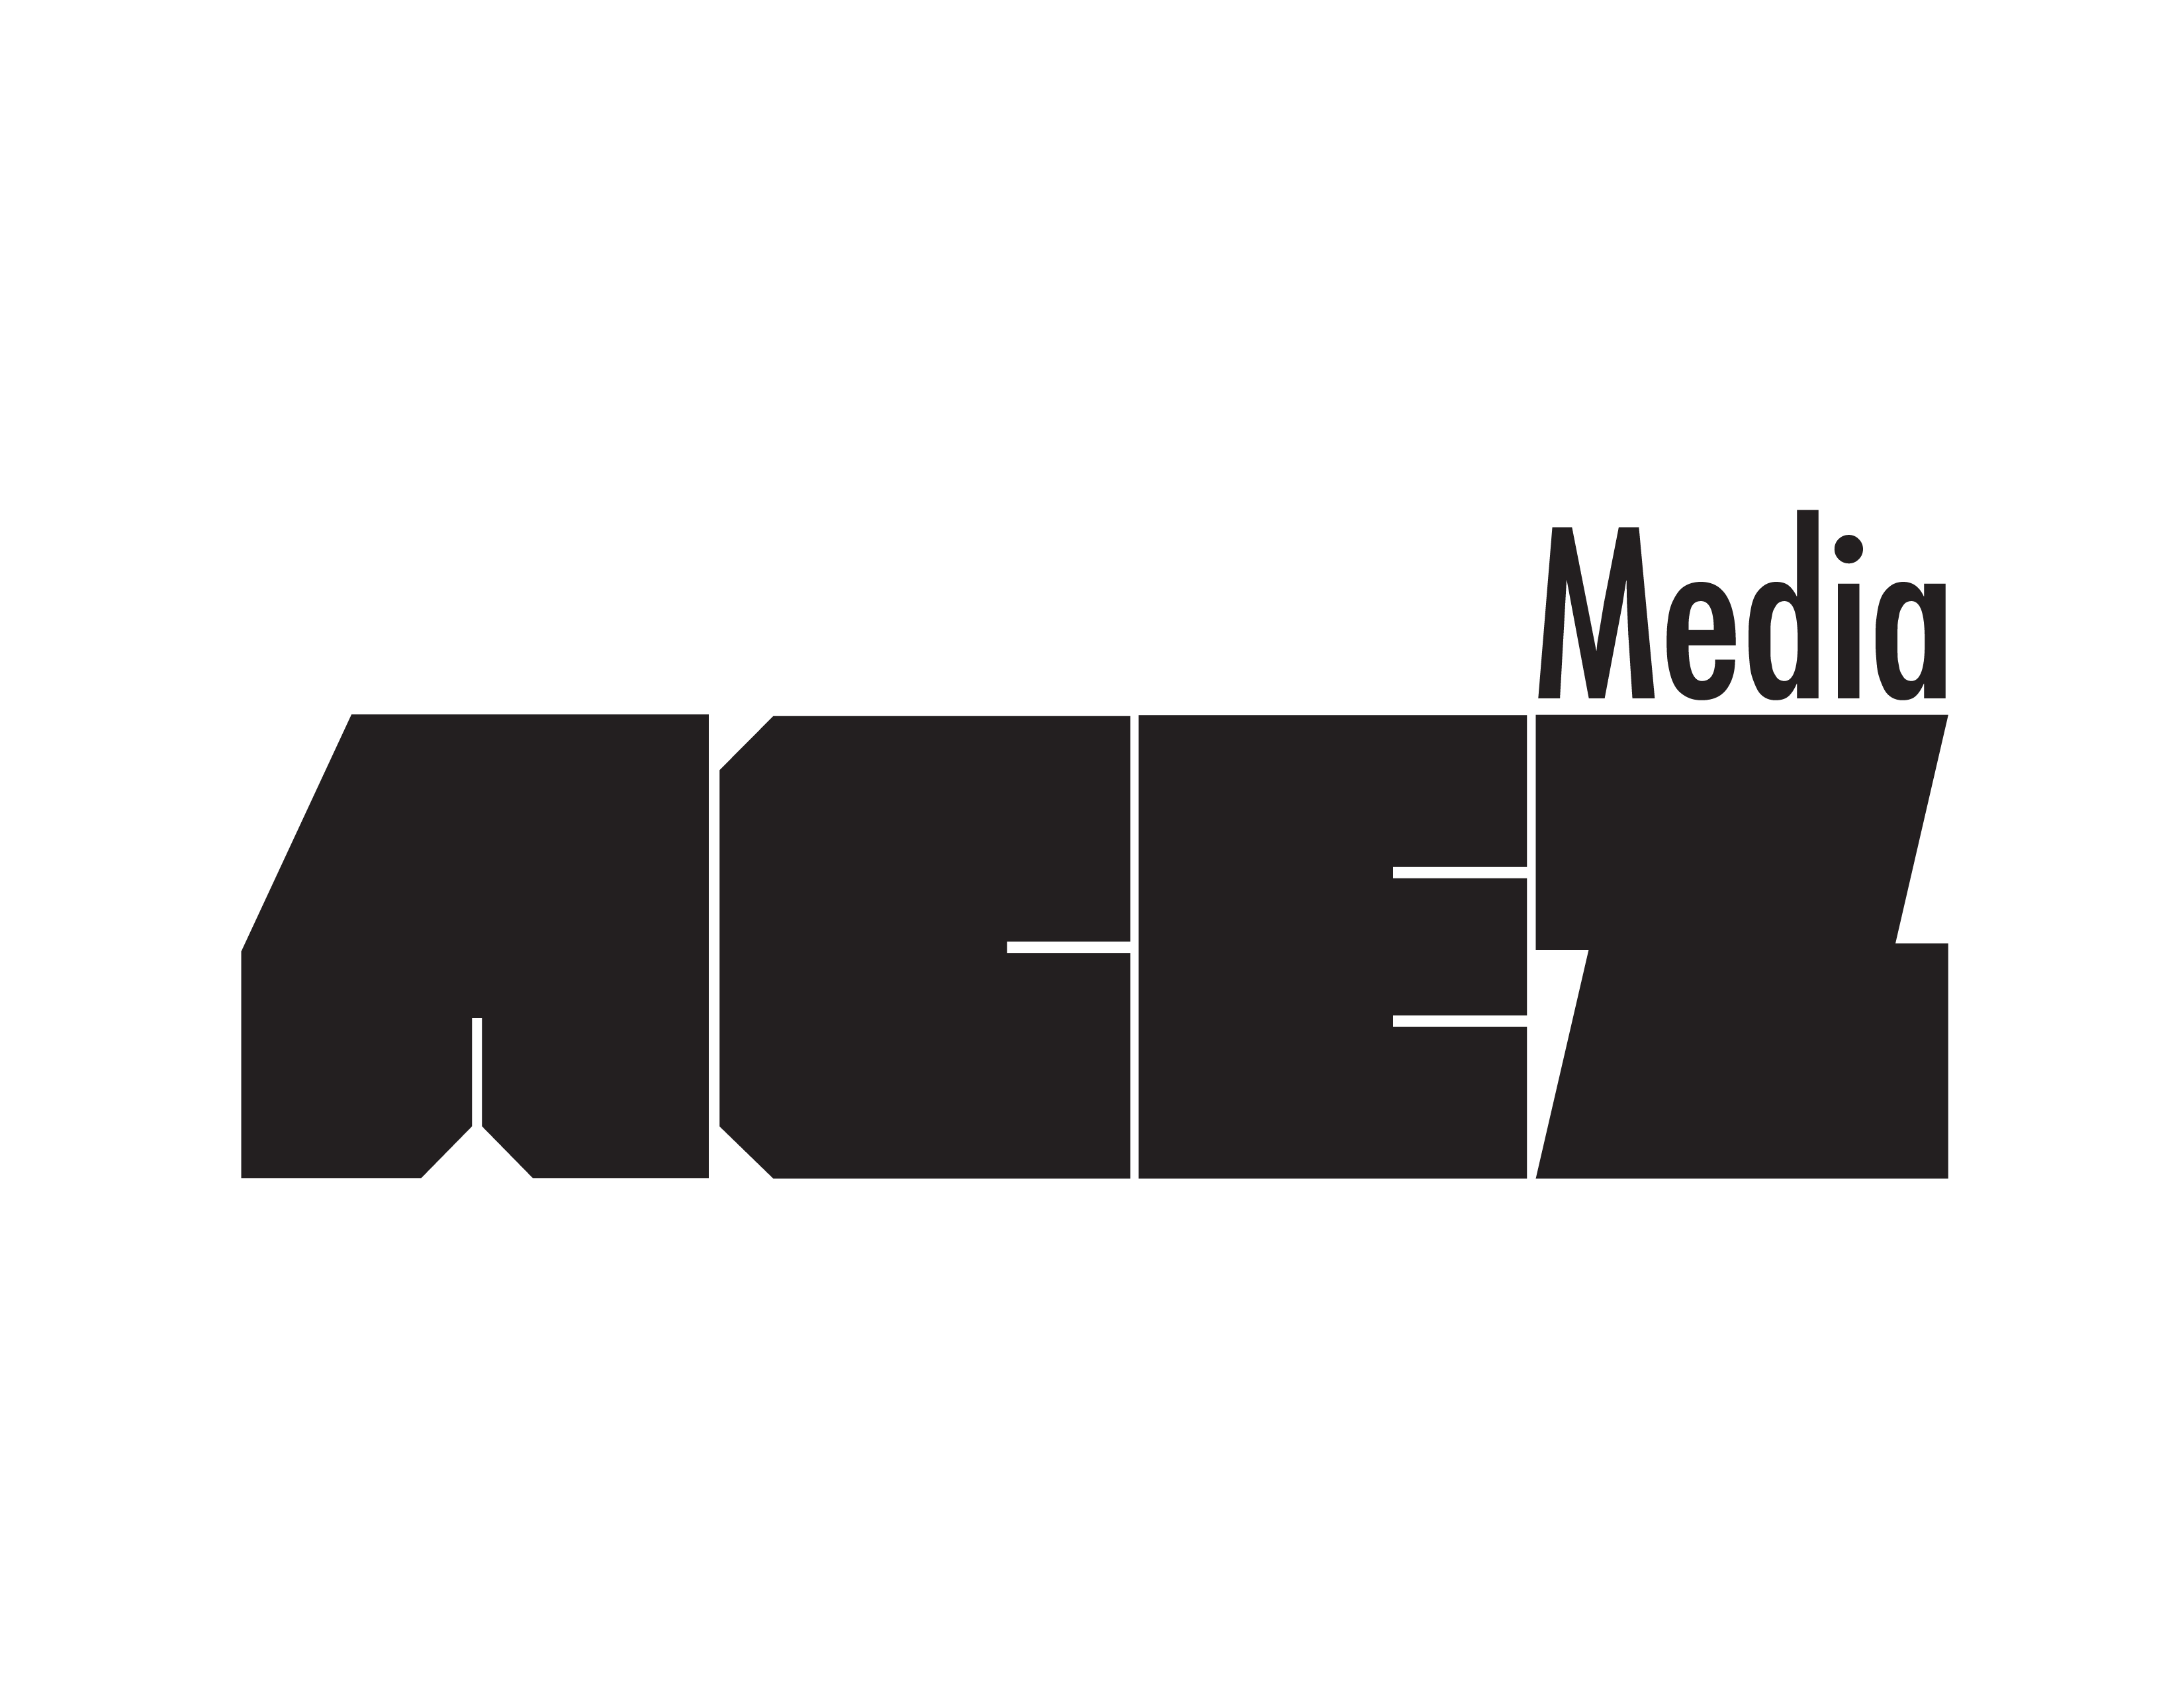 Acez Media